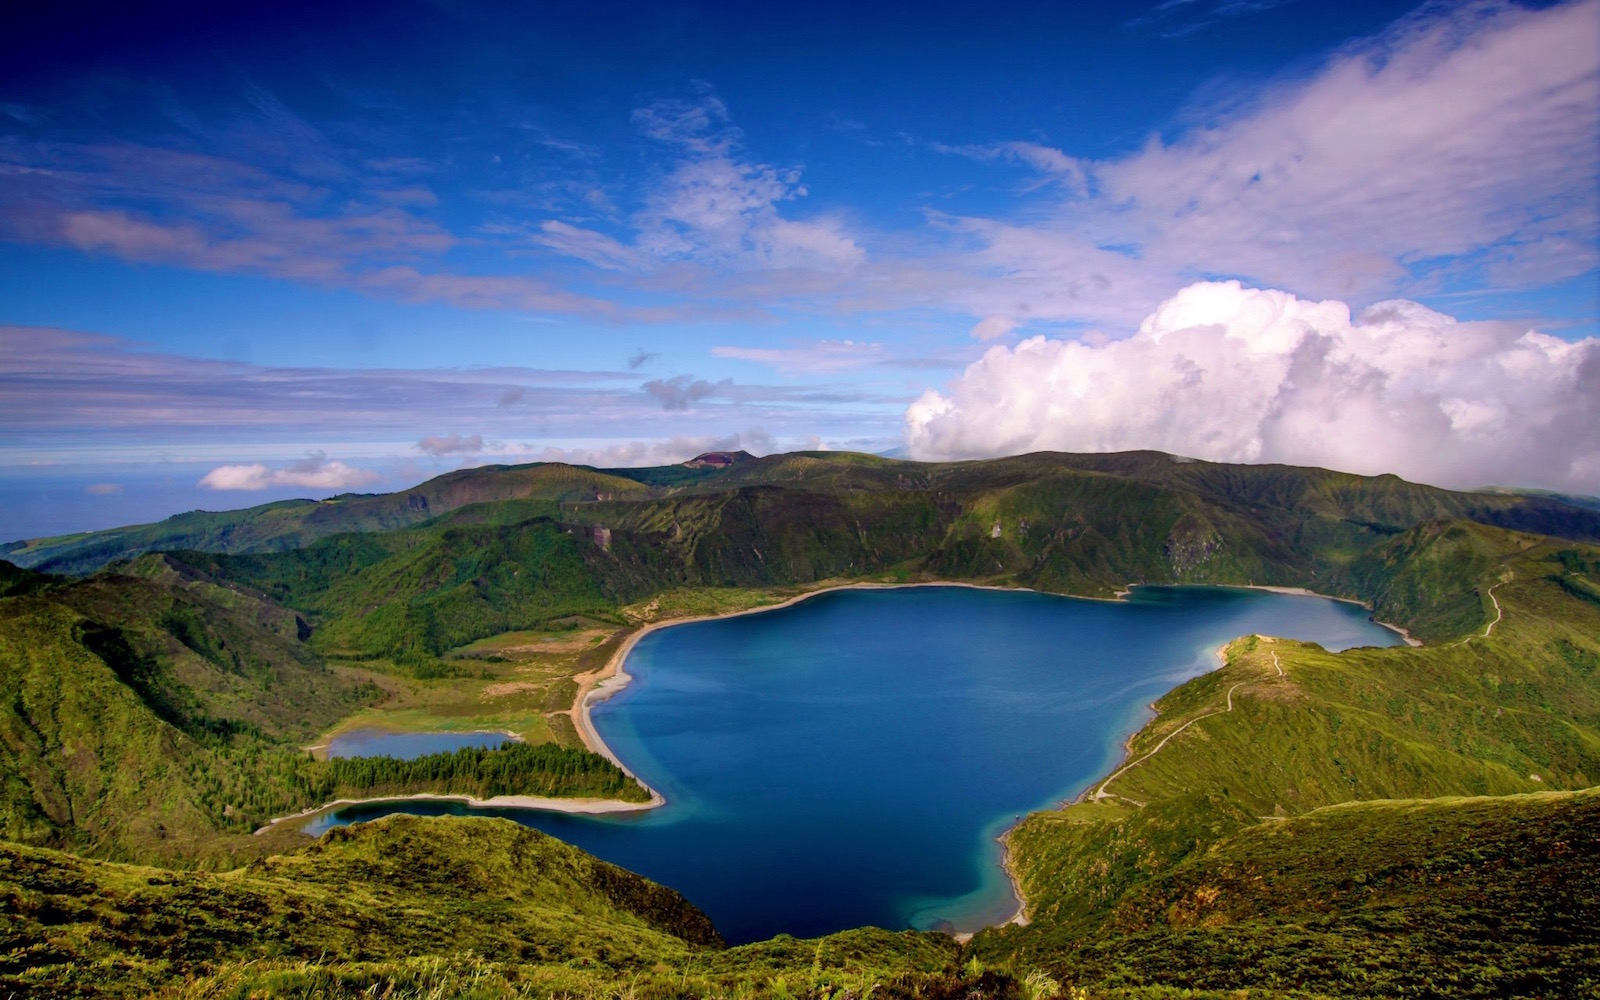 50 destinasi paling cantik dan menawan untuk dilawati di dunia